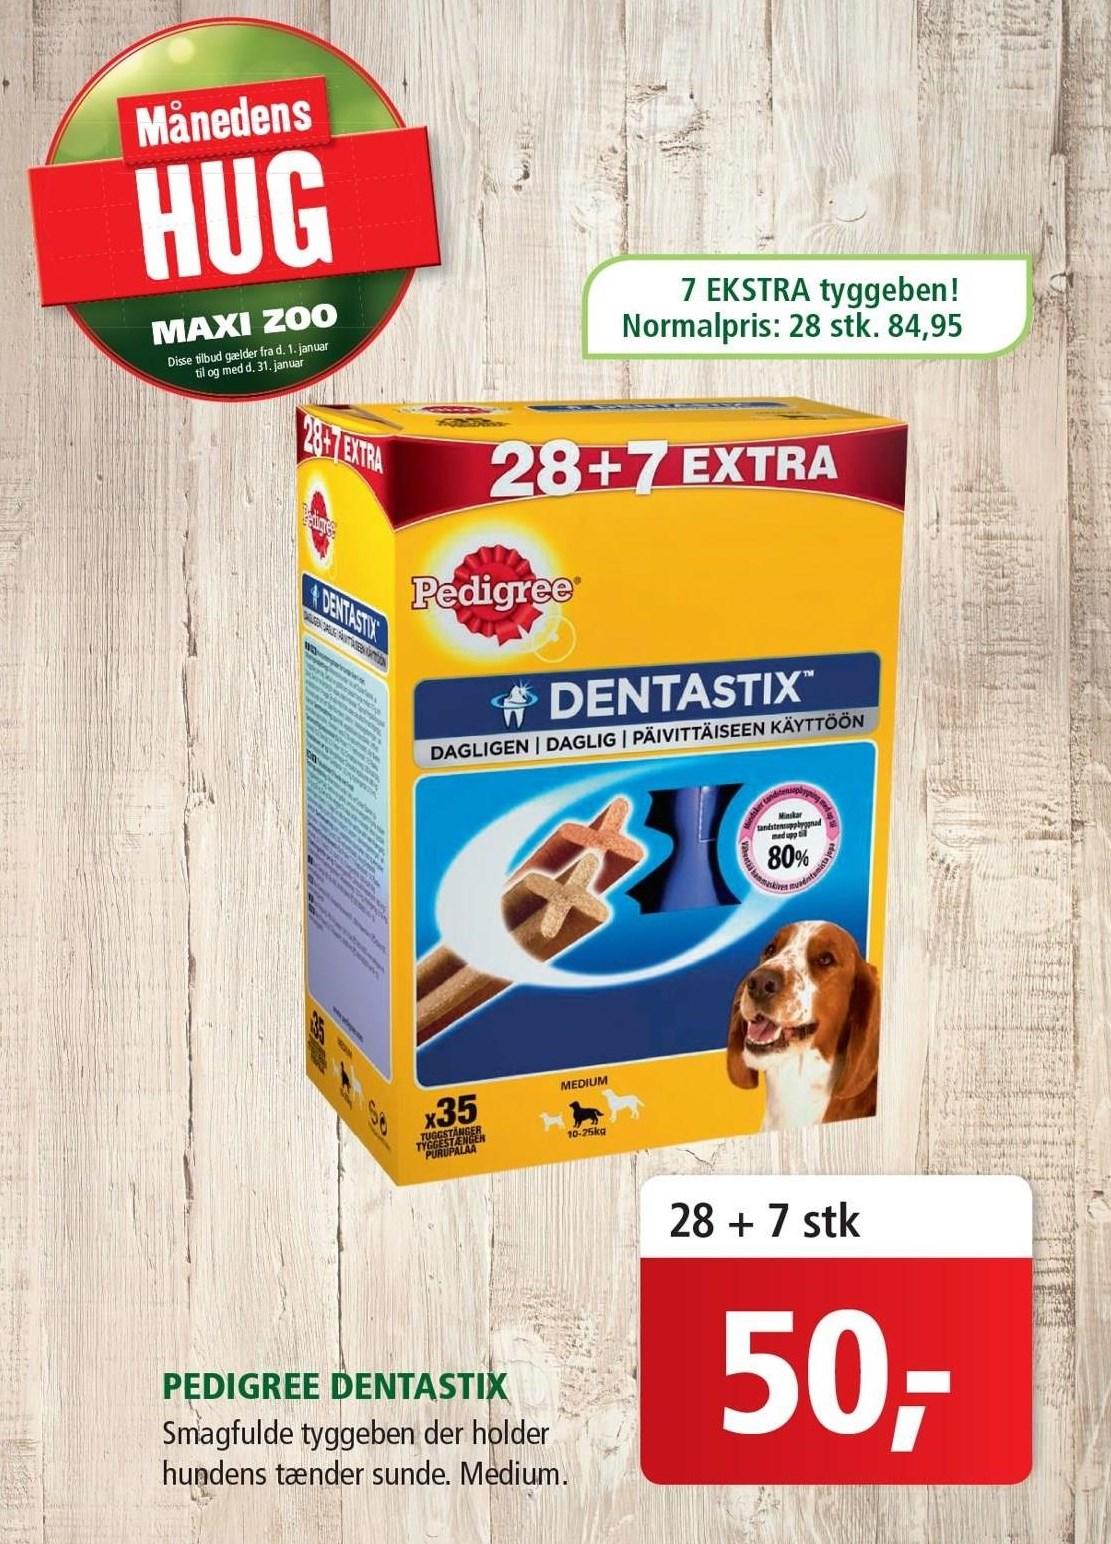 Pedigree Dentastix 7 ekstra